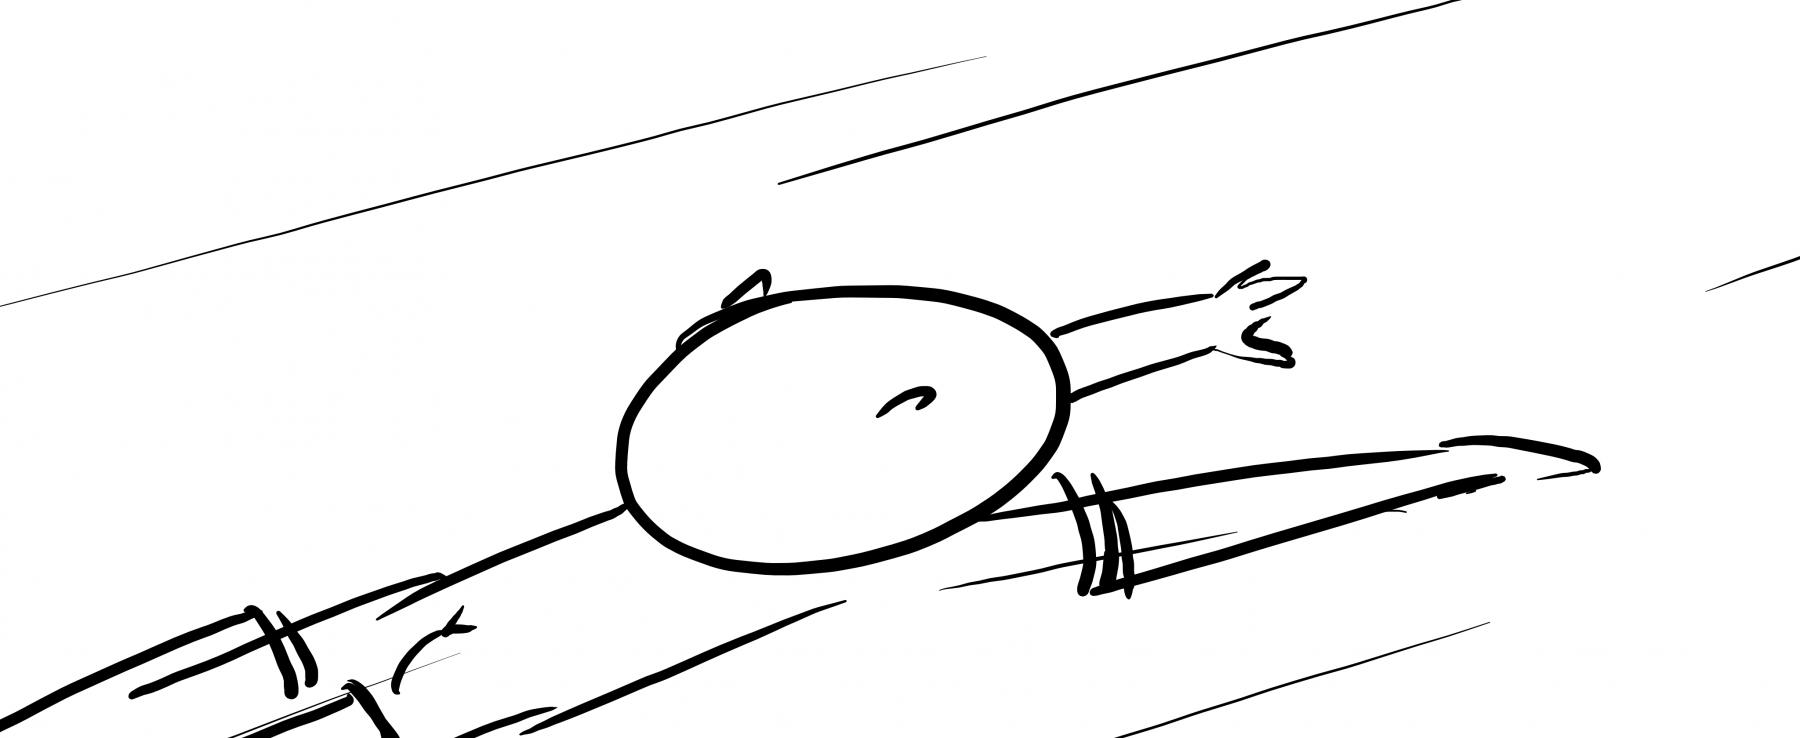 Nut-Thumbnail-Rough-Board00287